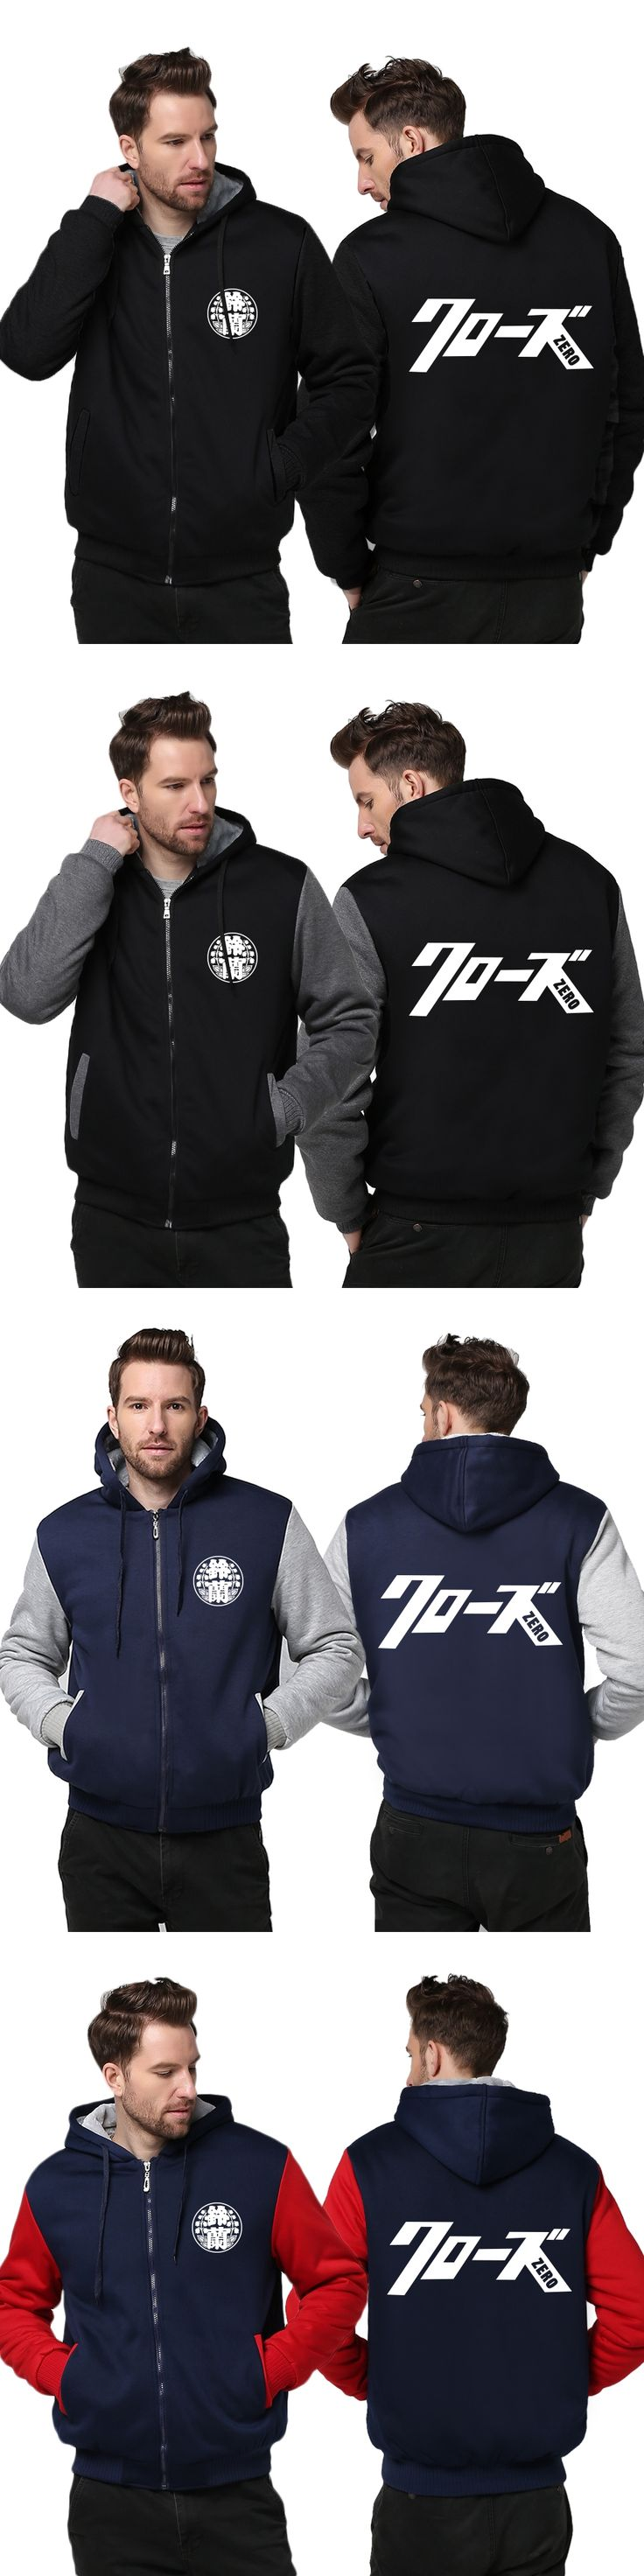 USA size Men Kurozu Crows ZERO Logo Takiya Genji Cosplay Zipper Jacket Thicken Hoodie Coat Clothing Casual Hoodies Sweatshirts